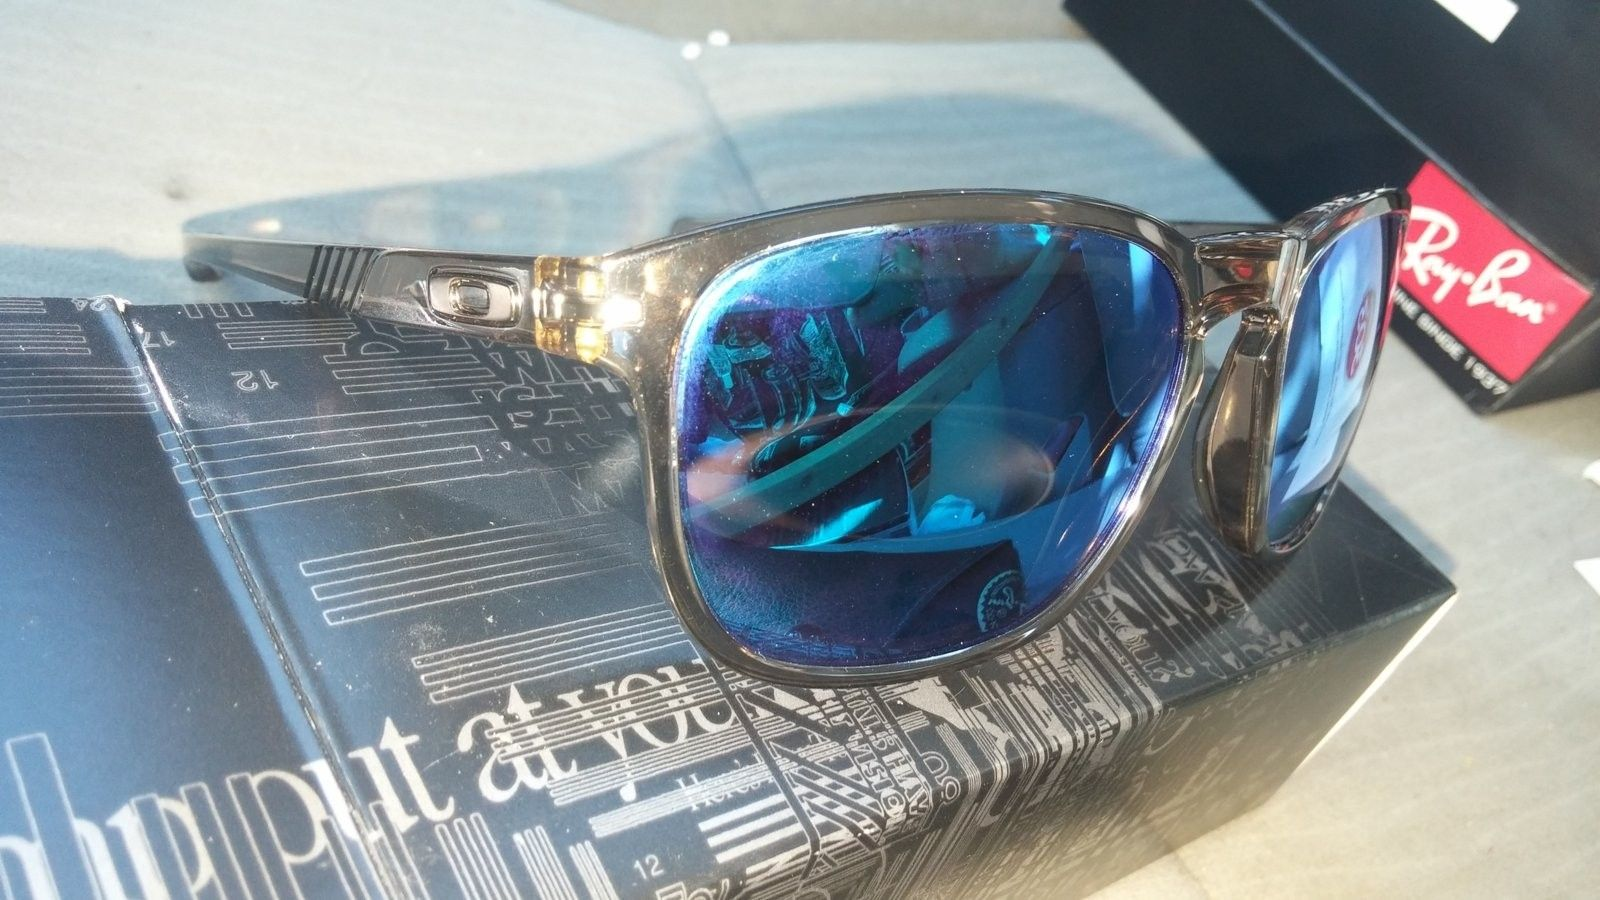 Trade for Jupiter squared lenses ...Oakley Enduro need to sell.   Asap .  Sepia with blue lenses - 20160823_161035.jpg